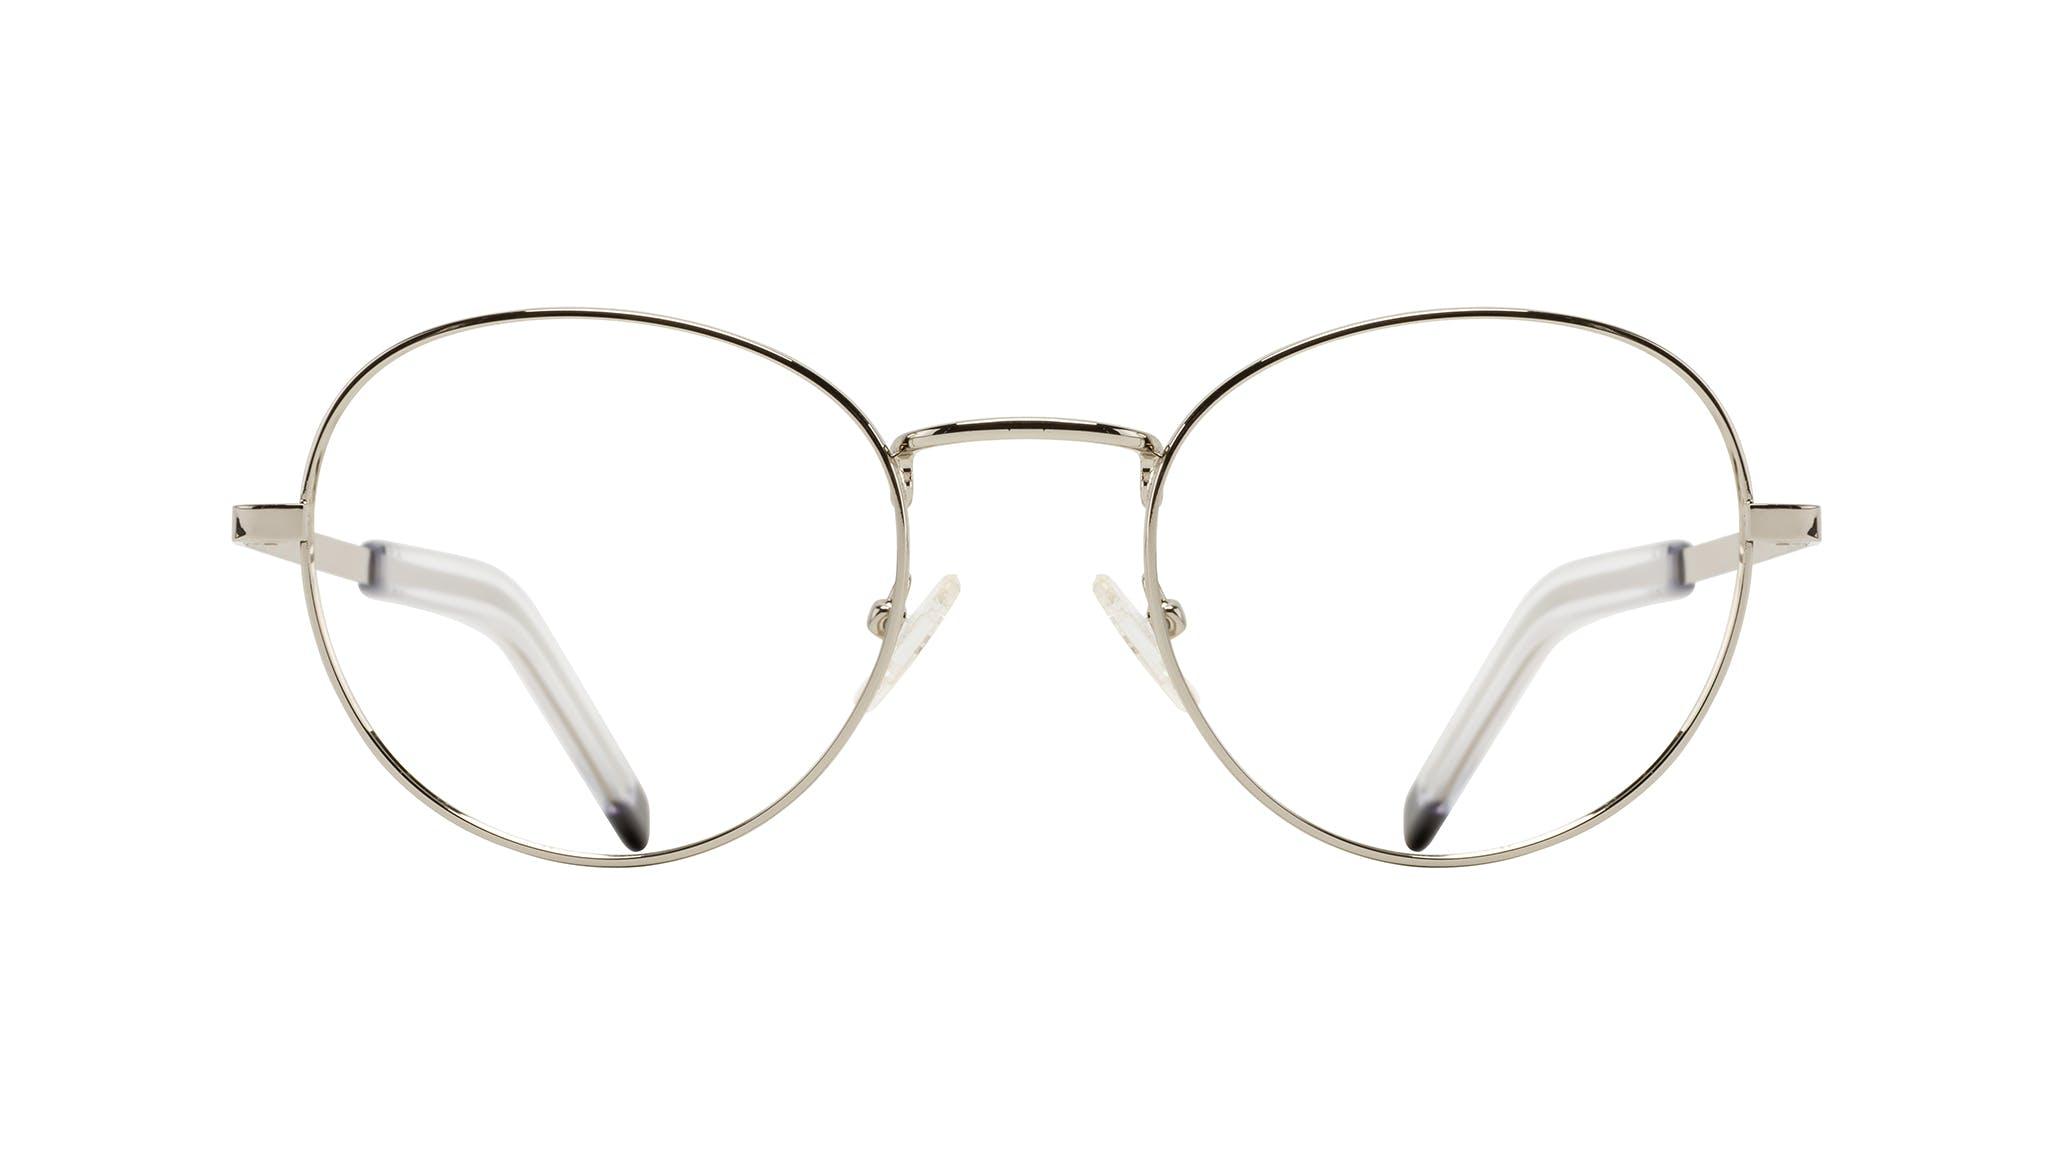 Affordable Fashion Glasses Round Eyeglasses Men Lean XL Silver